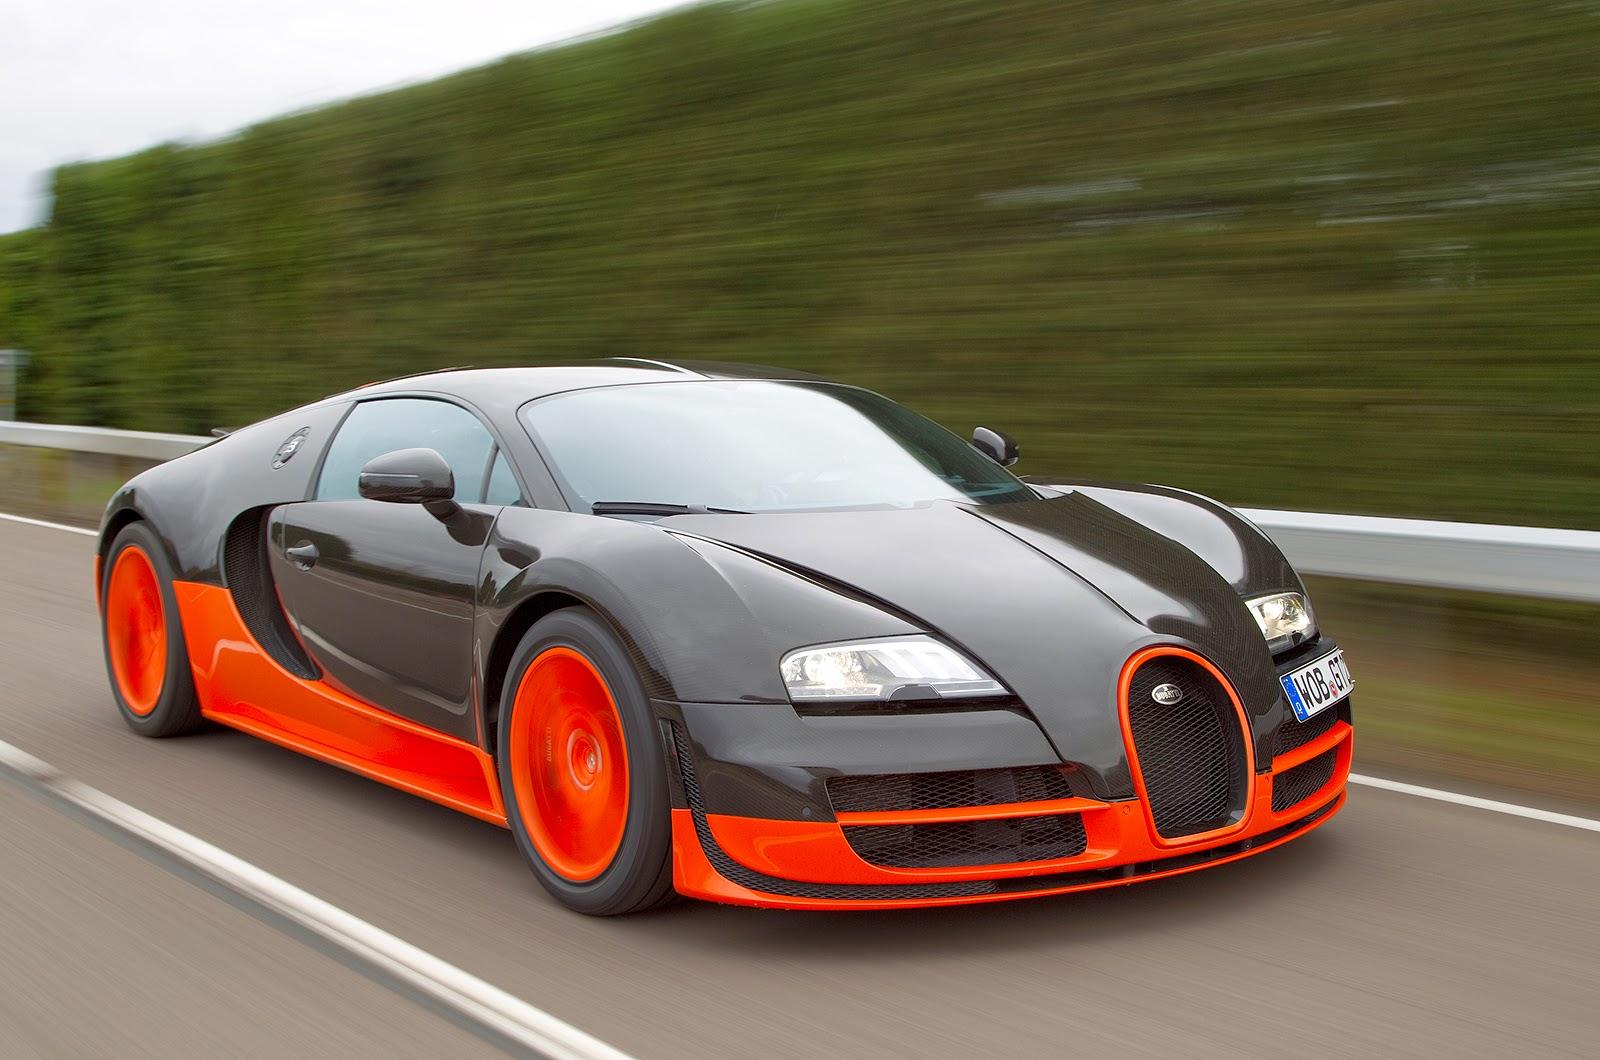 Is Bugatti the Fastest Car in the World